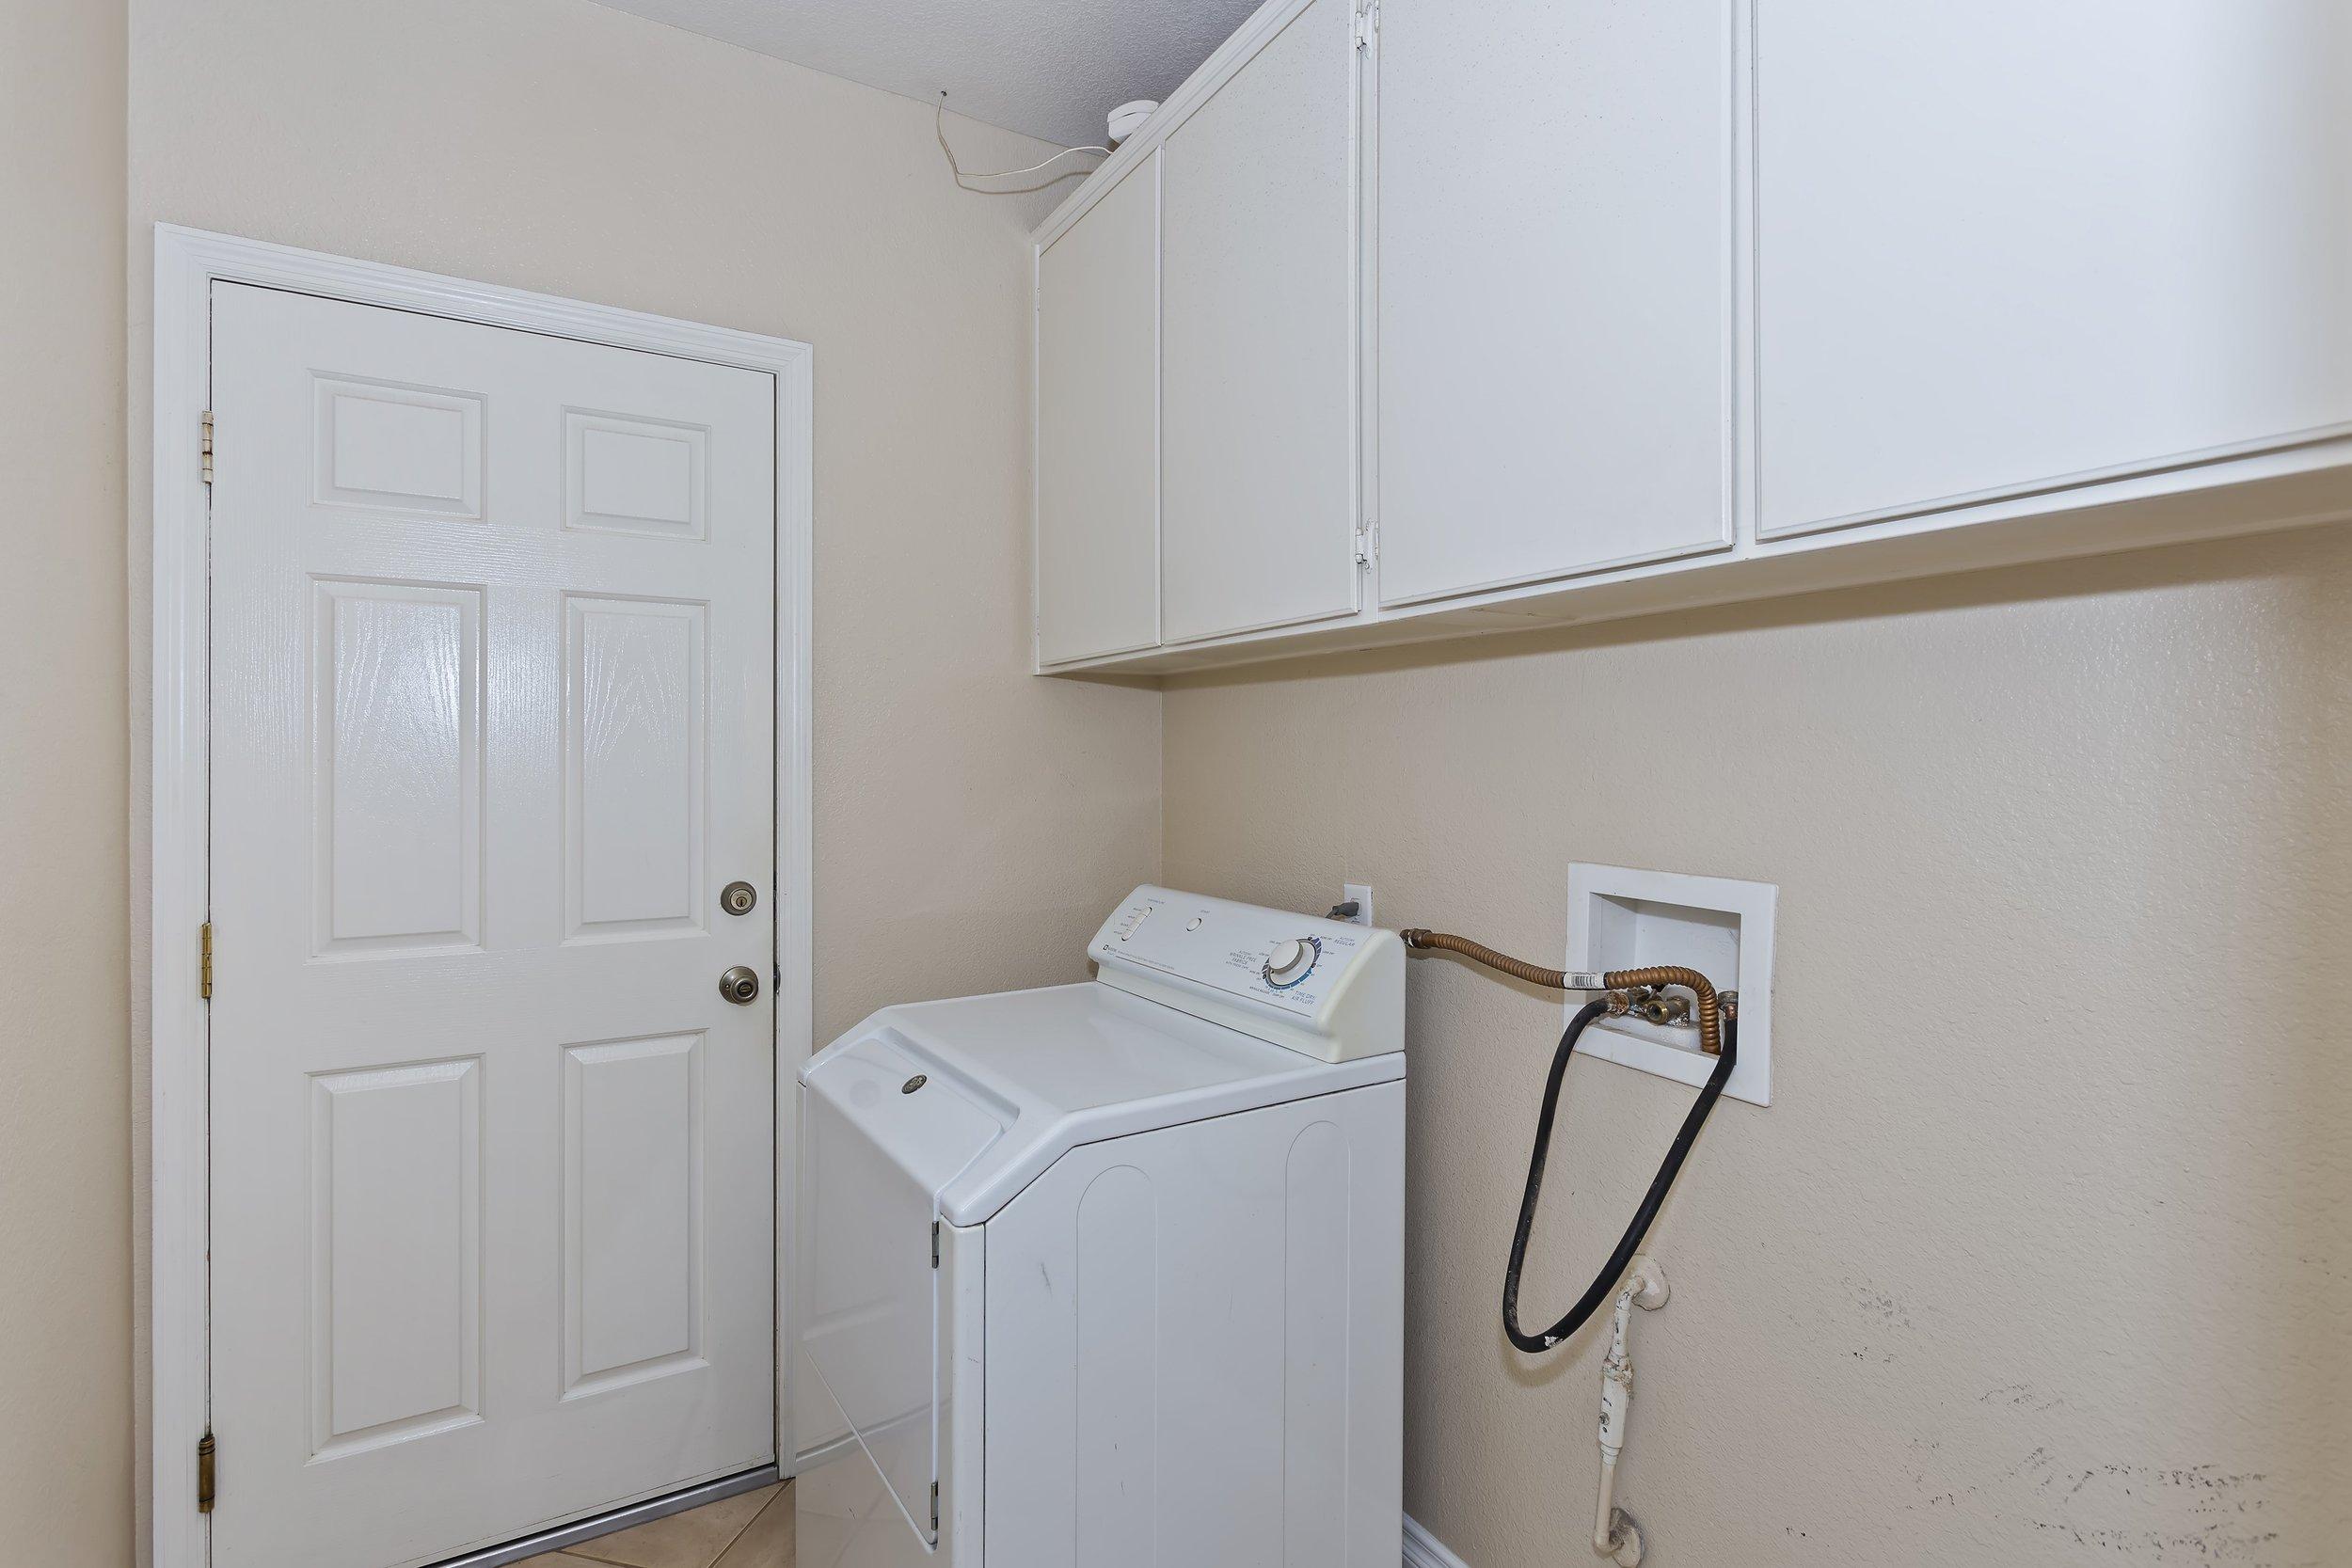 021_Laundry Room.jpg